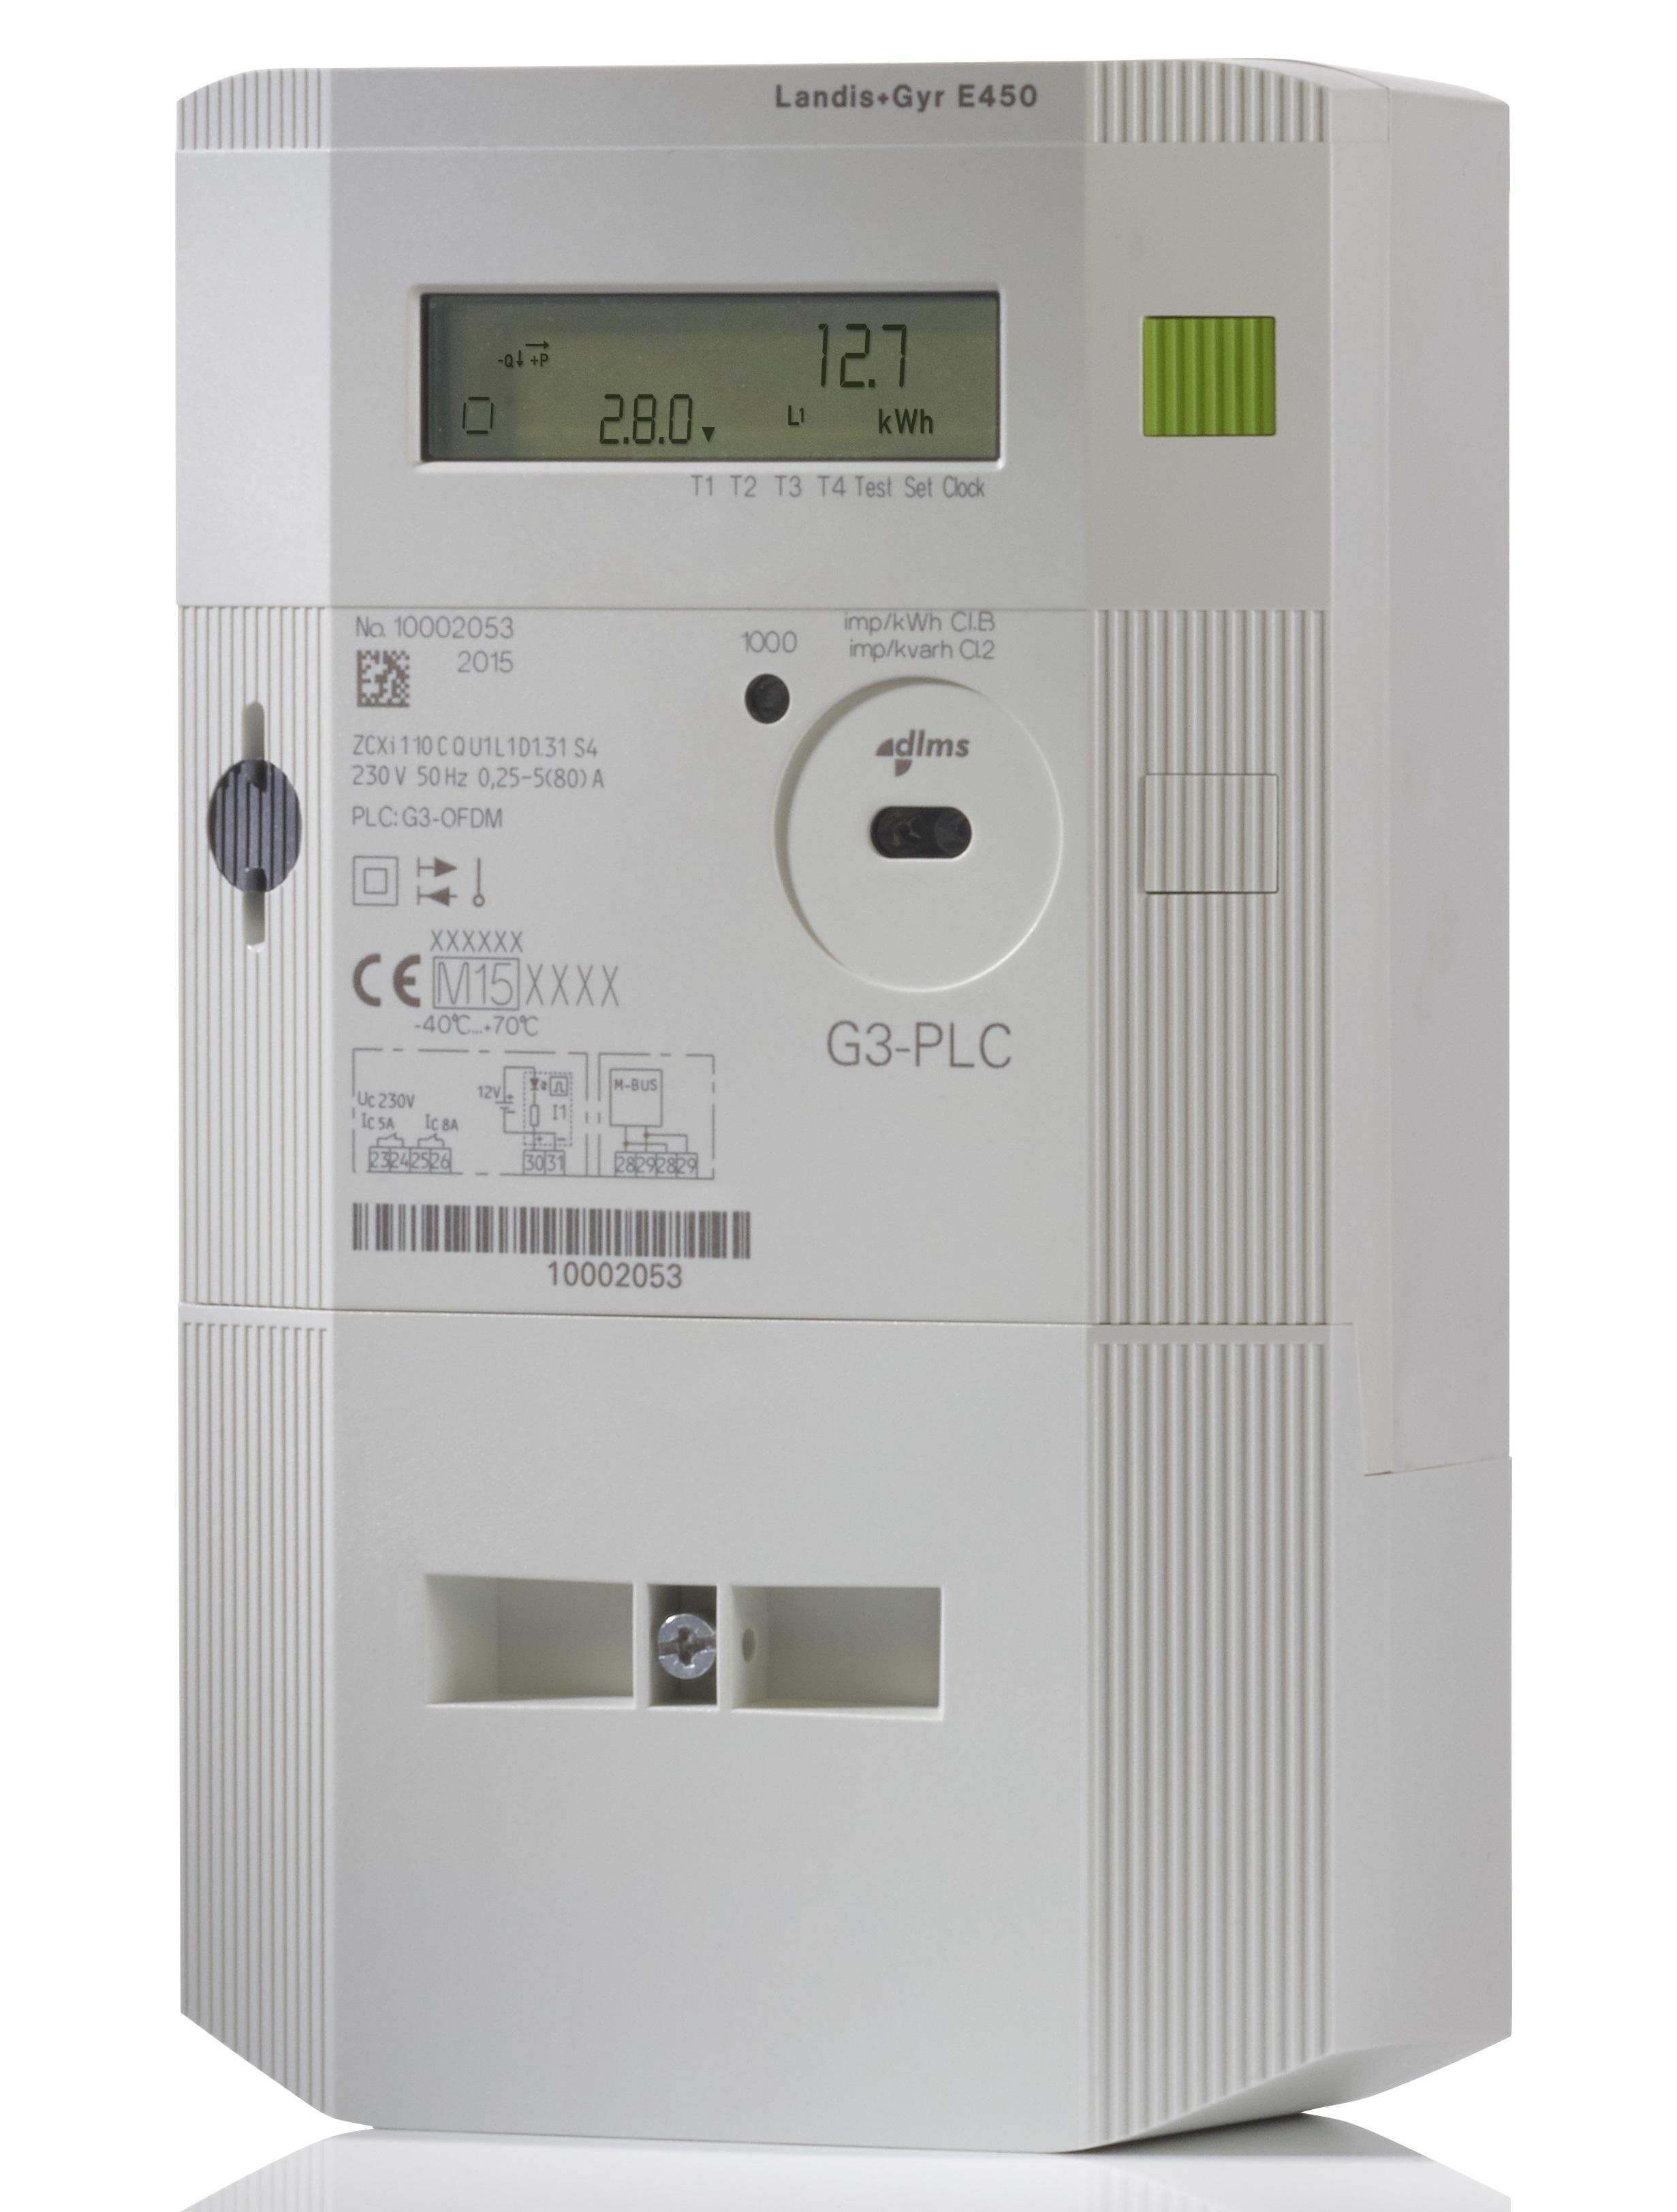 file landis gyr e450 g3 1 phase smart electricity meter jpg rh commons wikimedia org landis gyr e450 manual landis gyr e350 manual